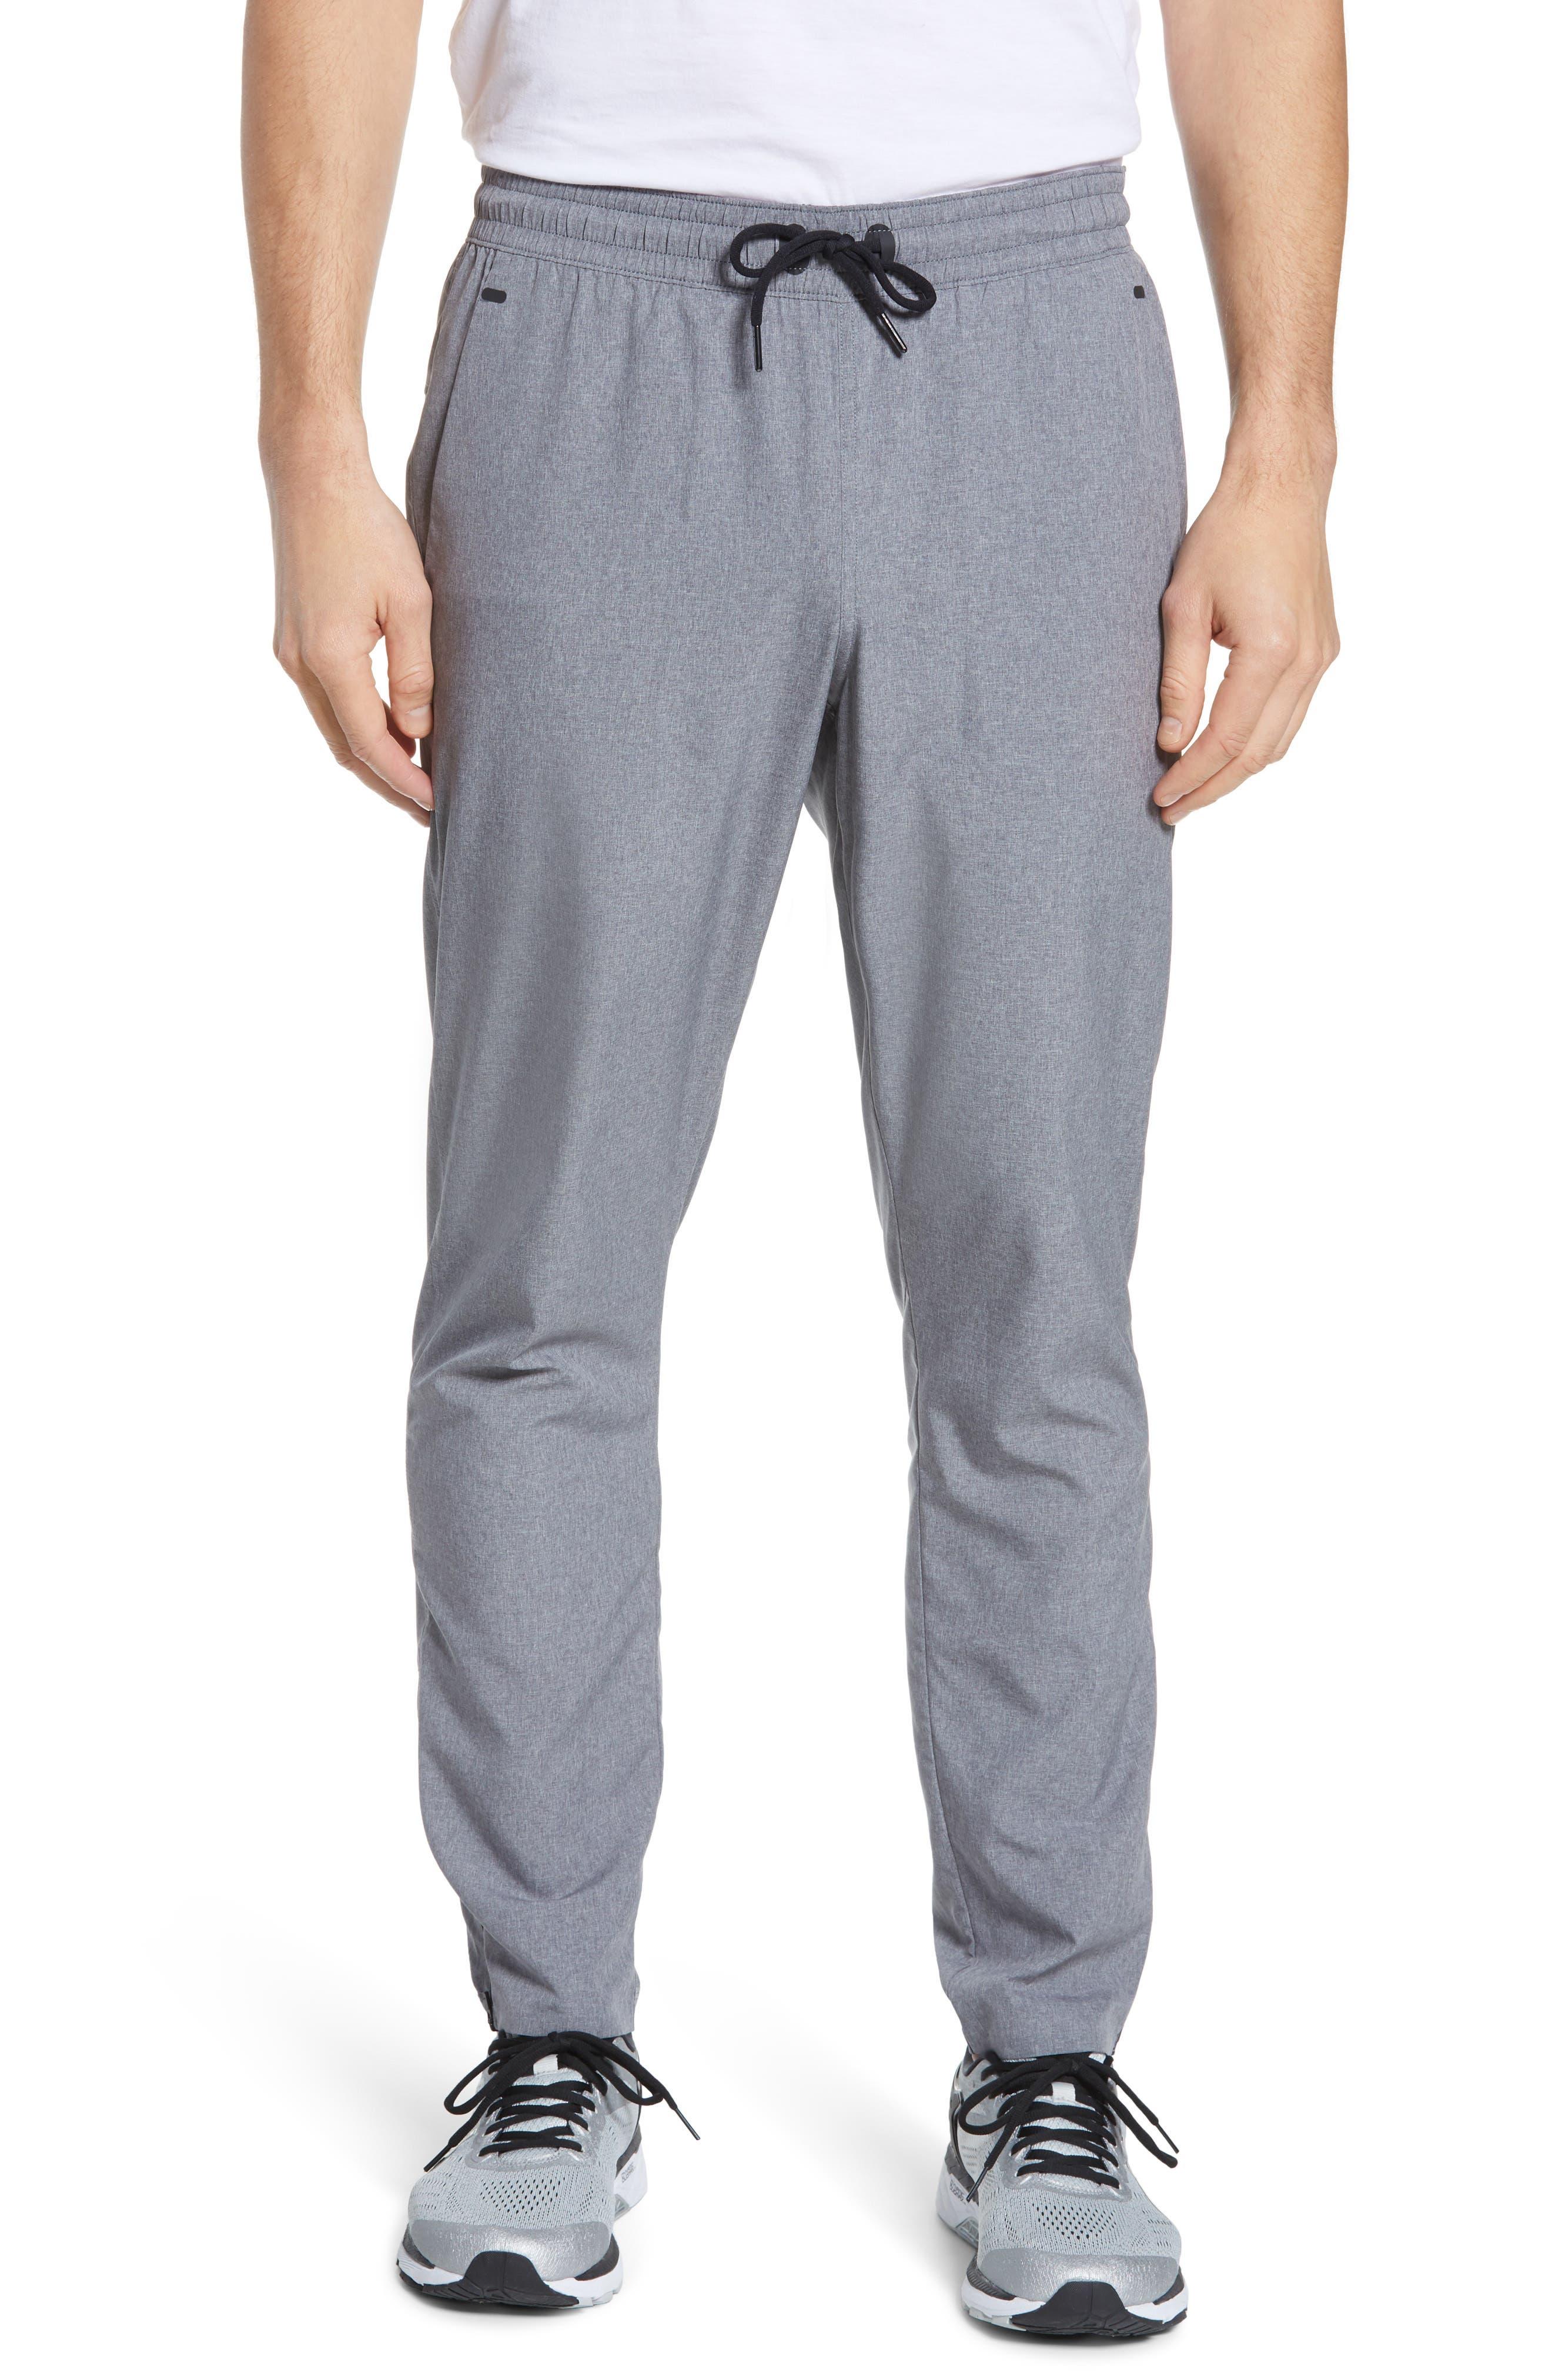 Men's Zella Stretch Woven Sweatpants